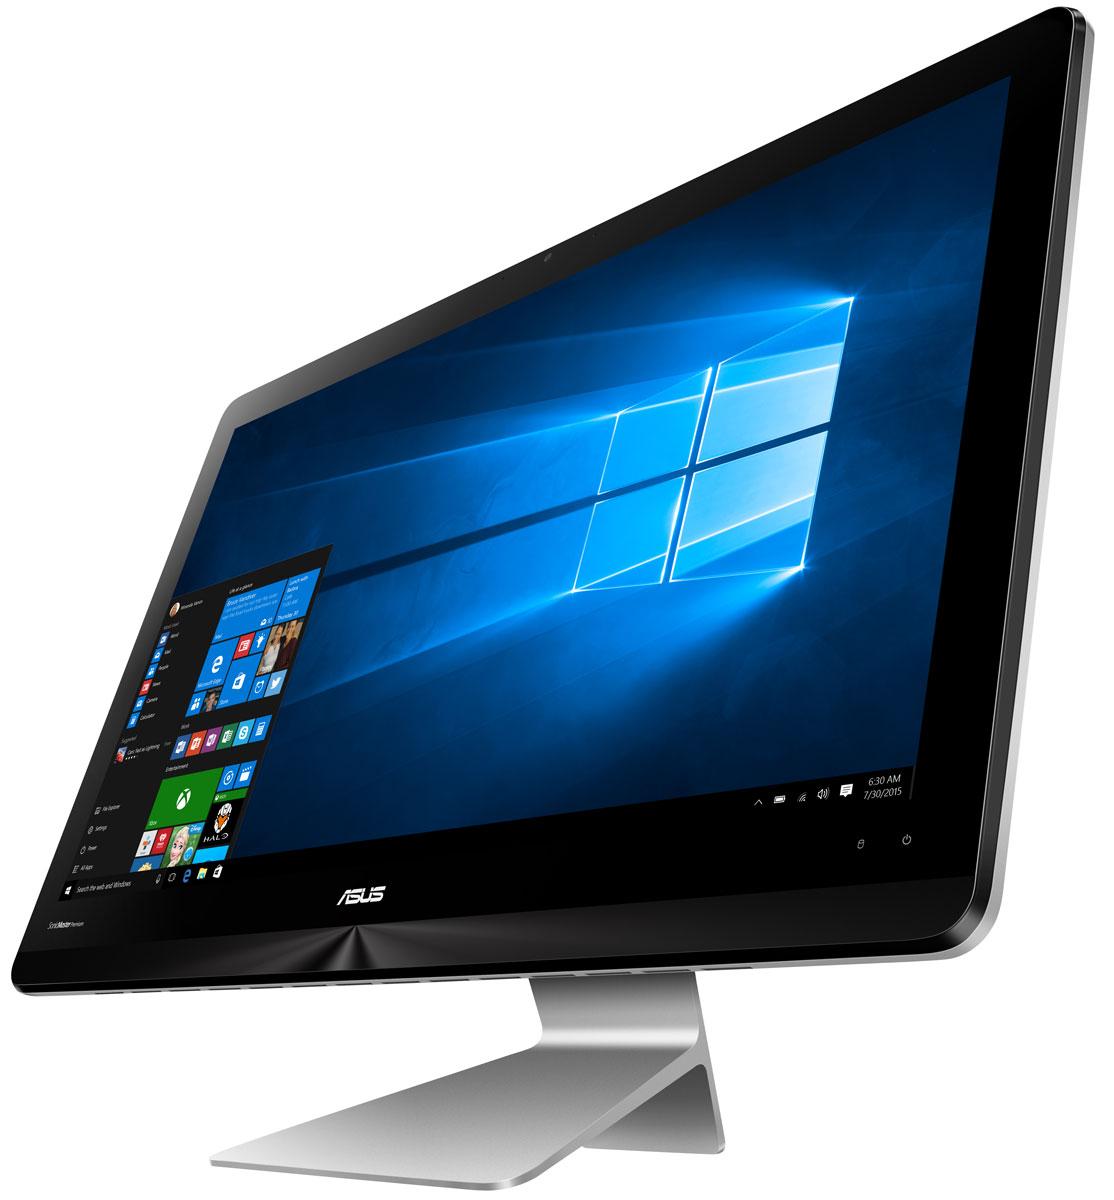 ASUS Zen AiO ZN220ICUK-RA033T, Gray моноблок - Настольные компьютеры и моноблоки